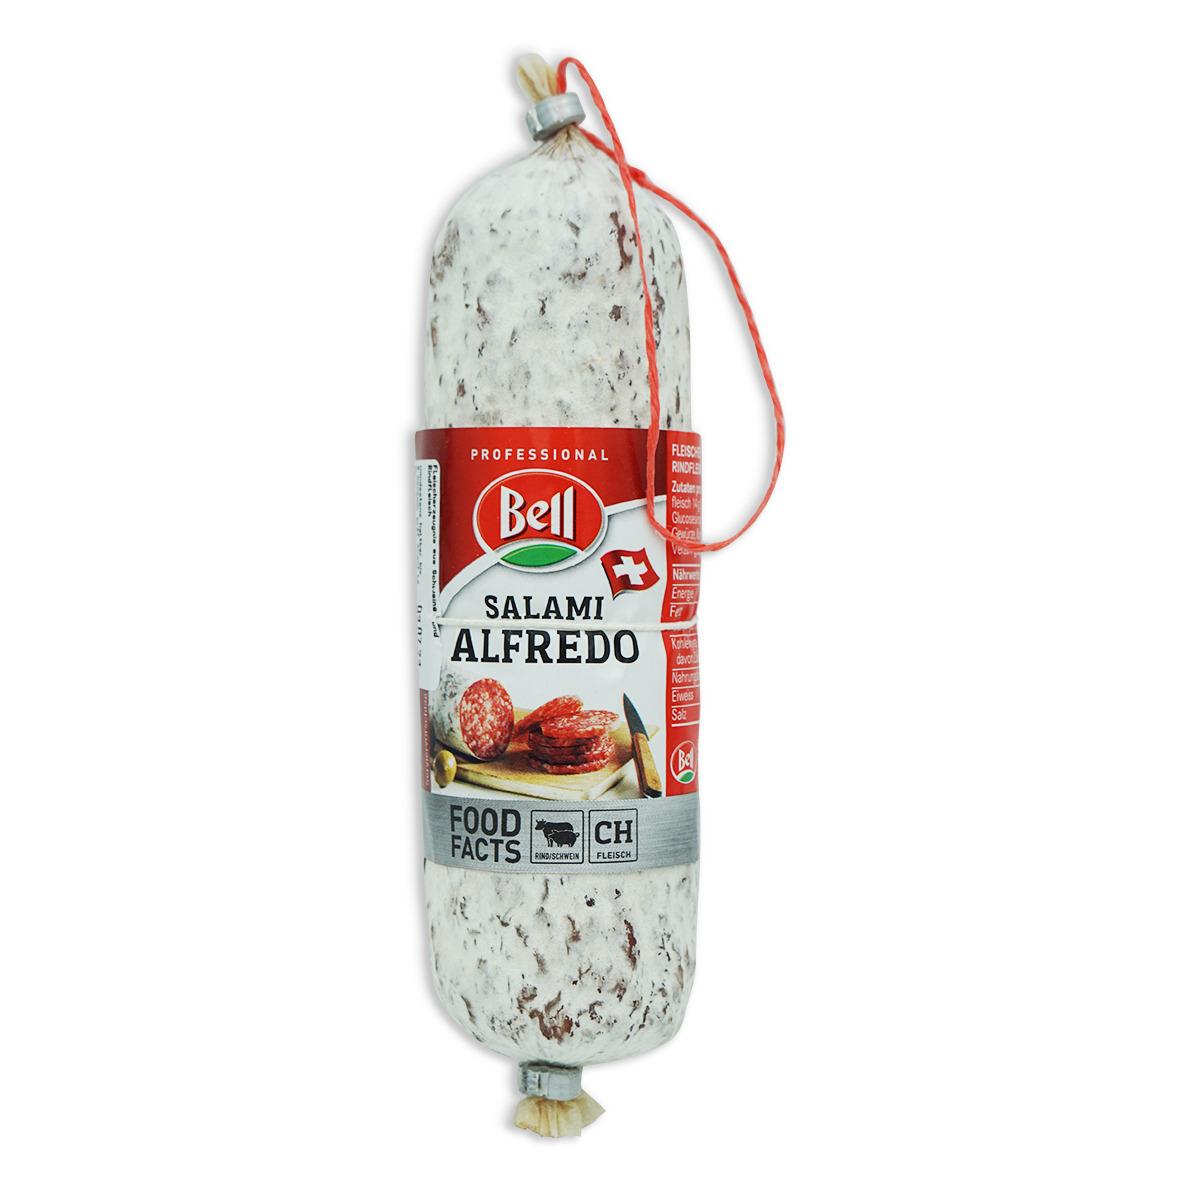 Bell Salami Alfredo